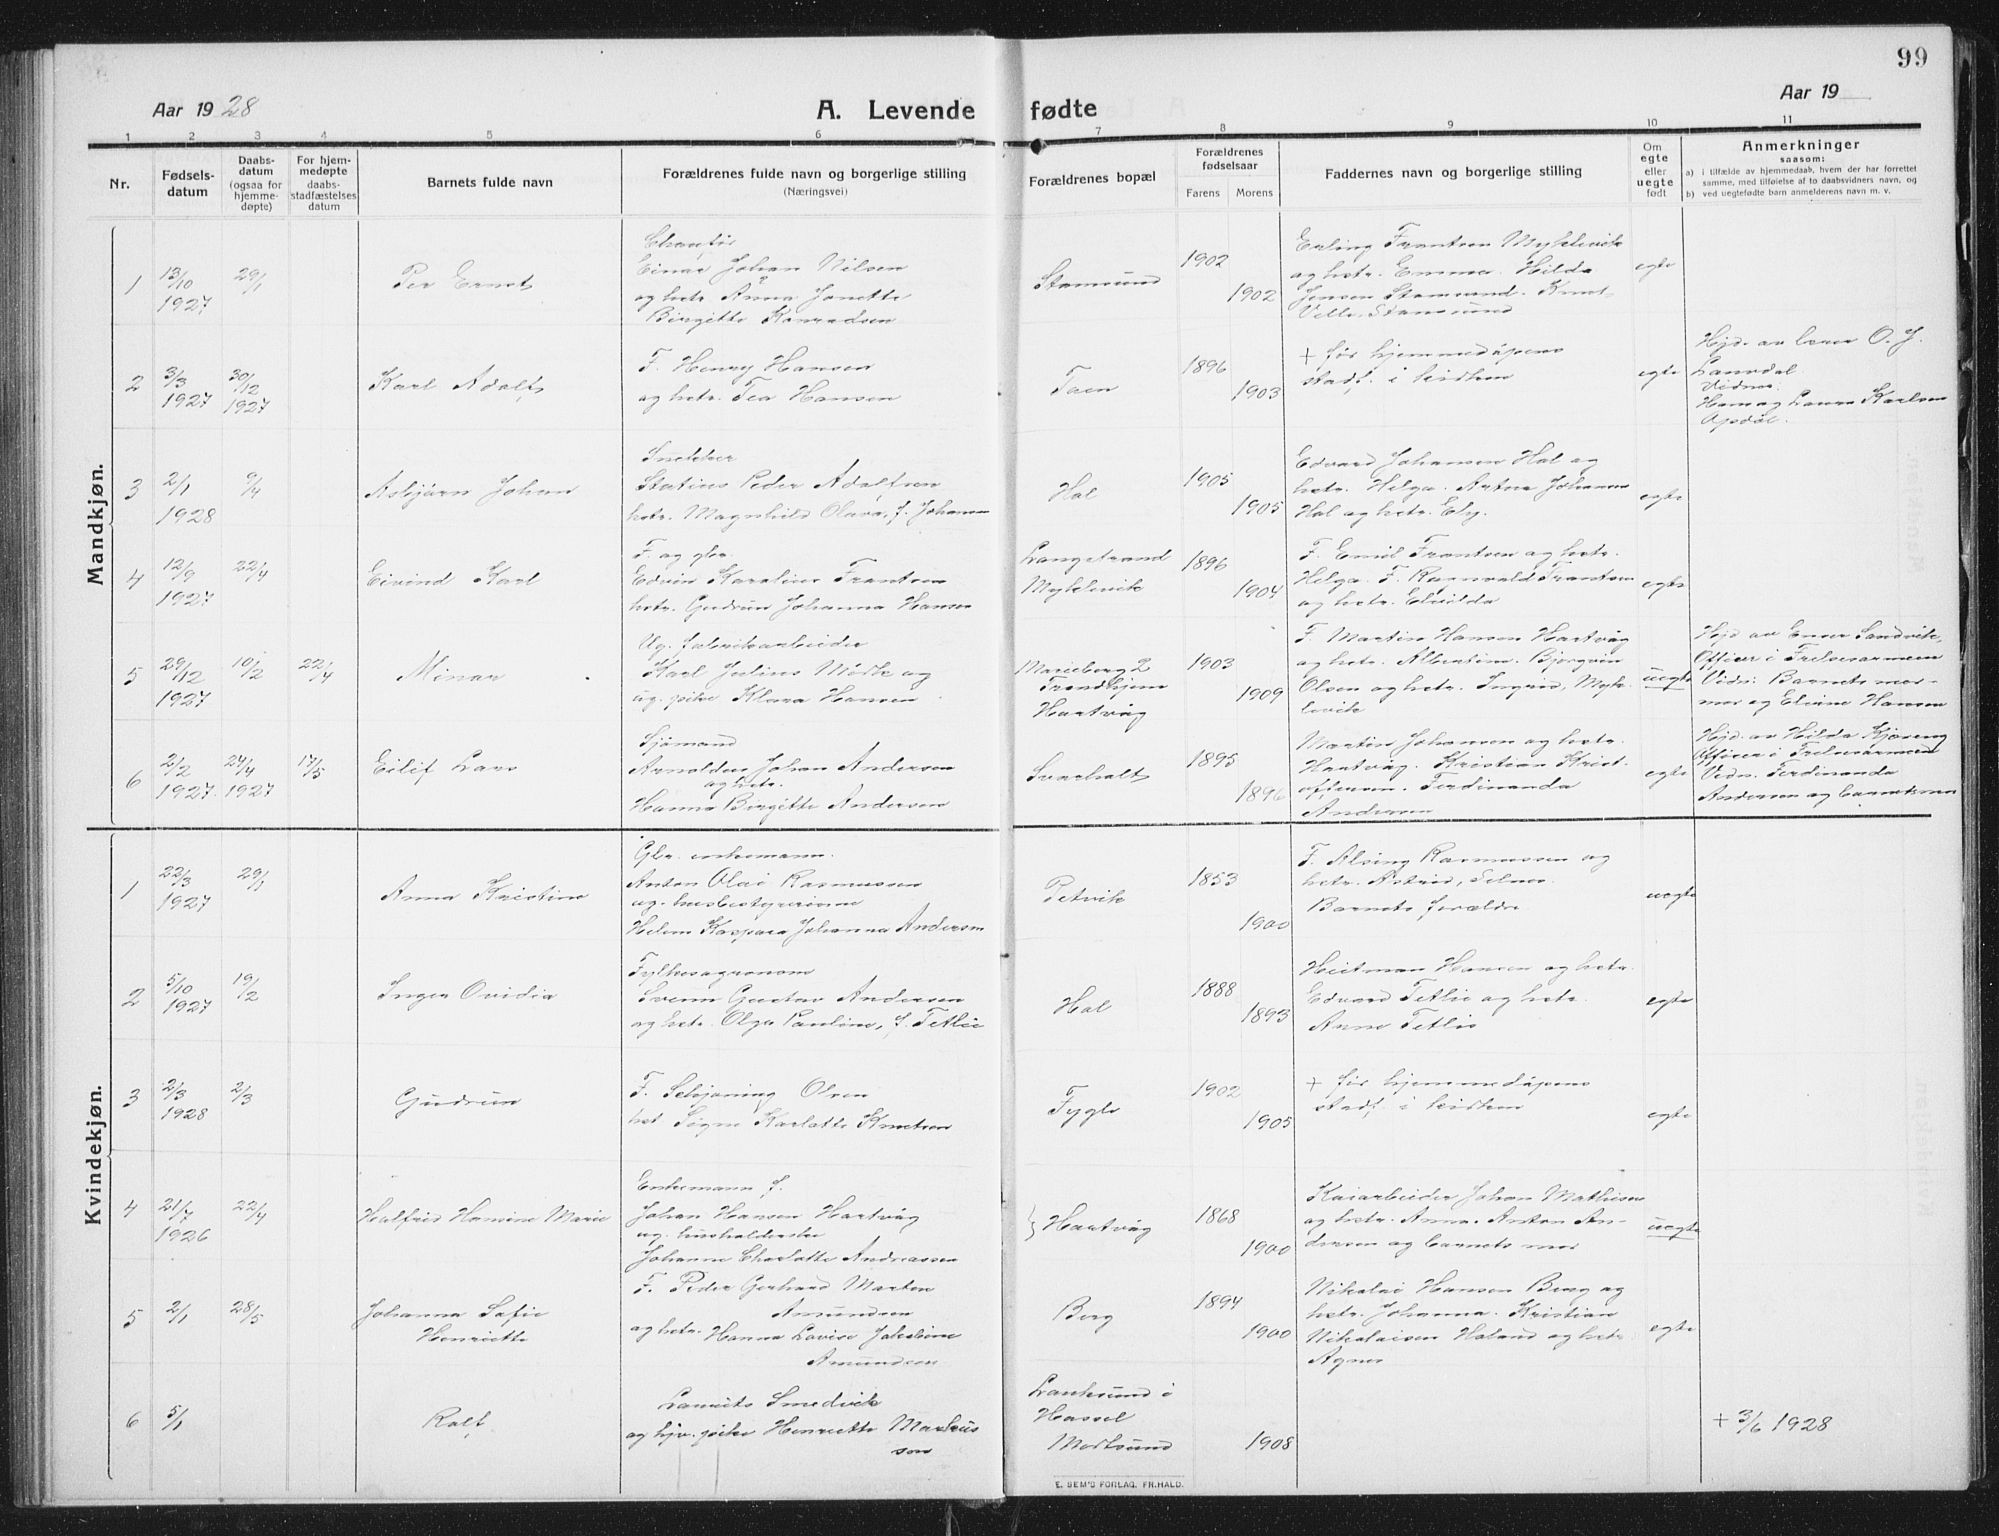 SAT, Ministerialprotokoller, klokkerbøker og fødselsregistre - Nordland, 882/L1183: Klokkerbok nr. 882C01, 1911-1938, s. 99